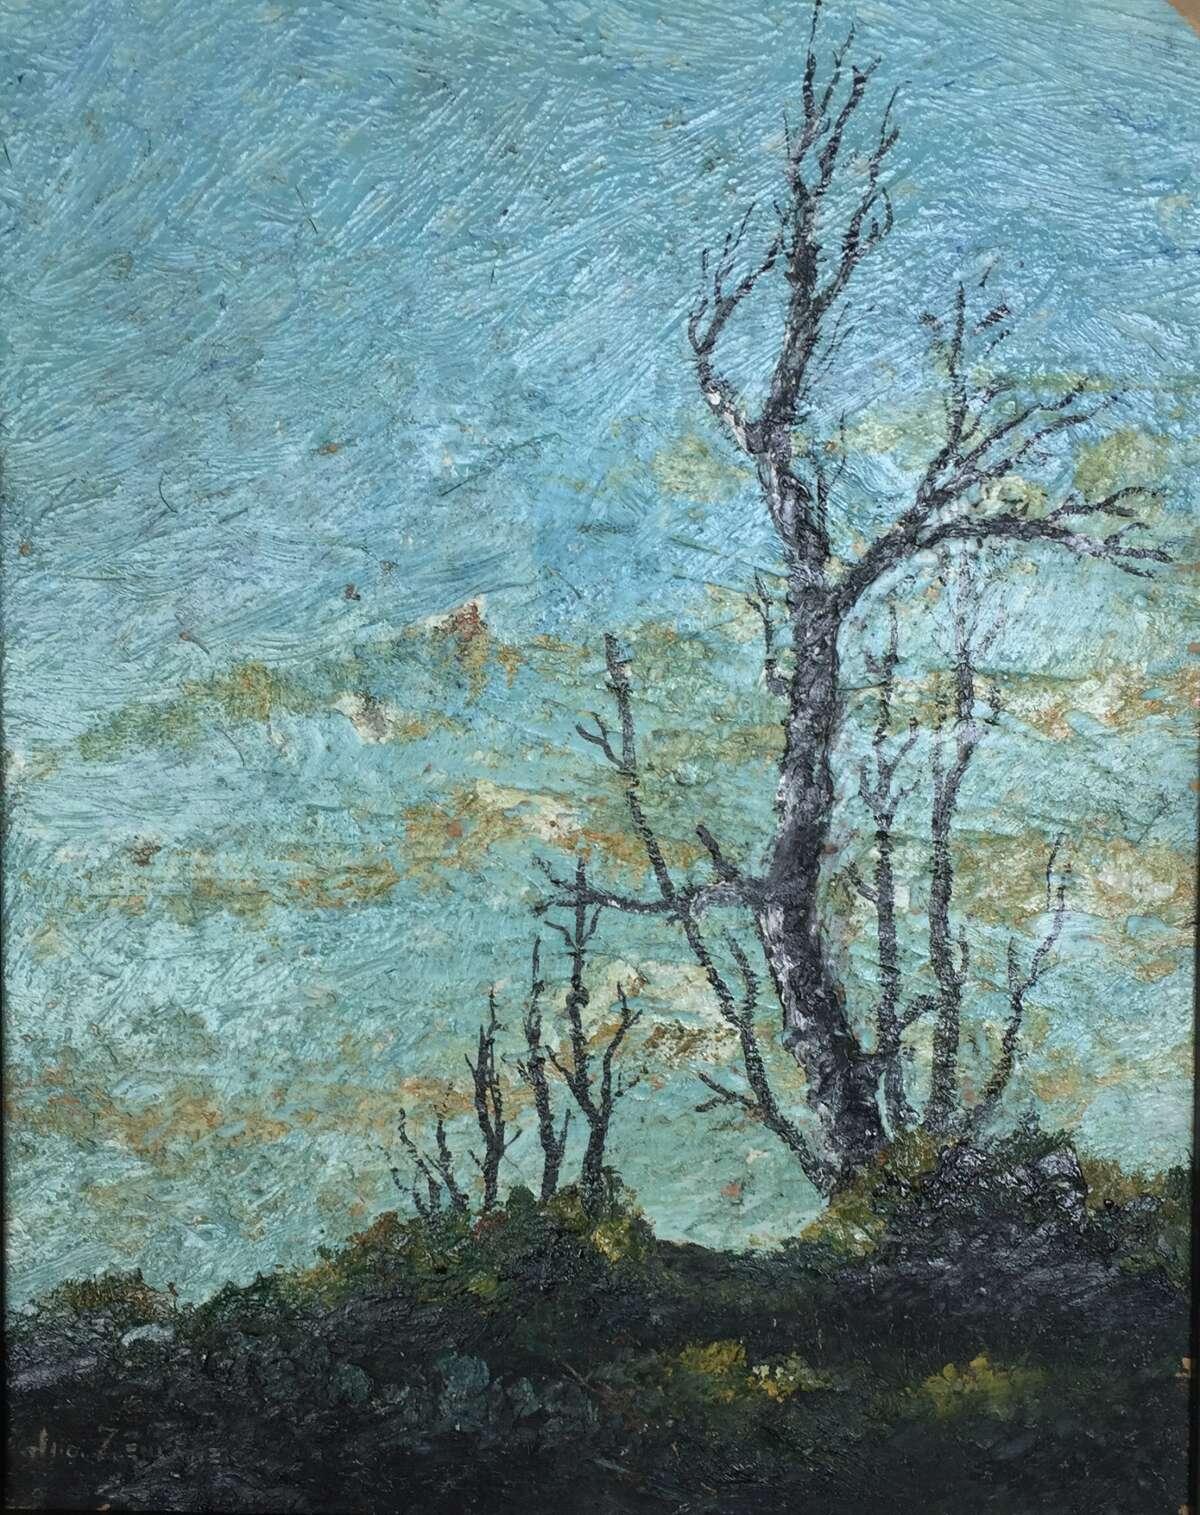 Landscape and Trees, oil on canvas, by John Zemanek.